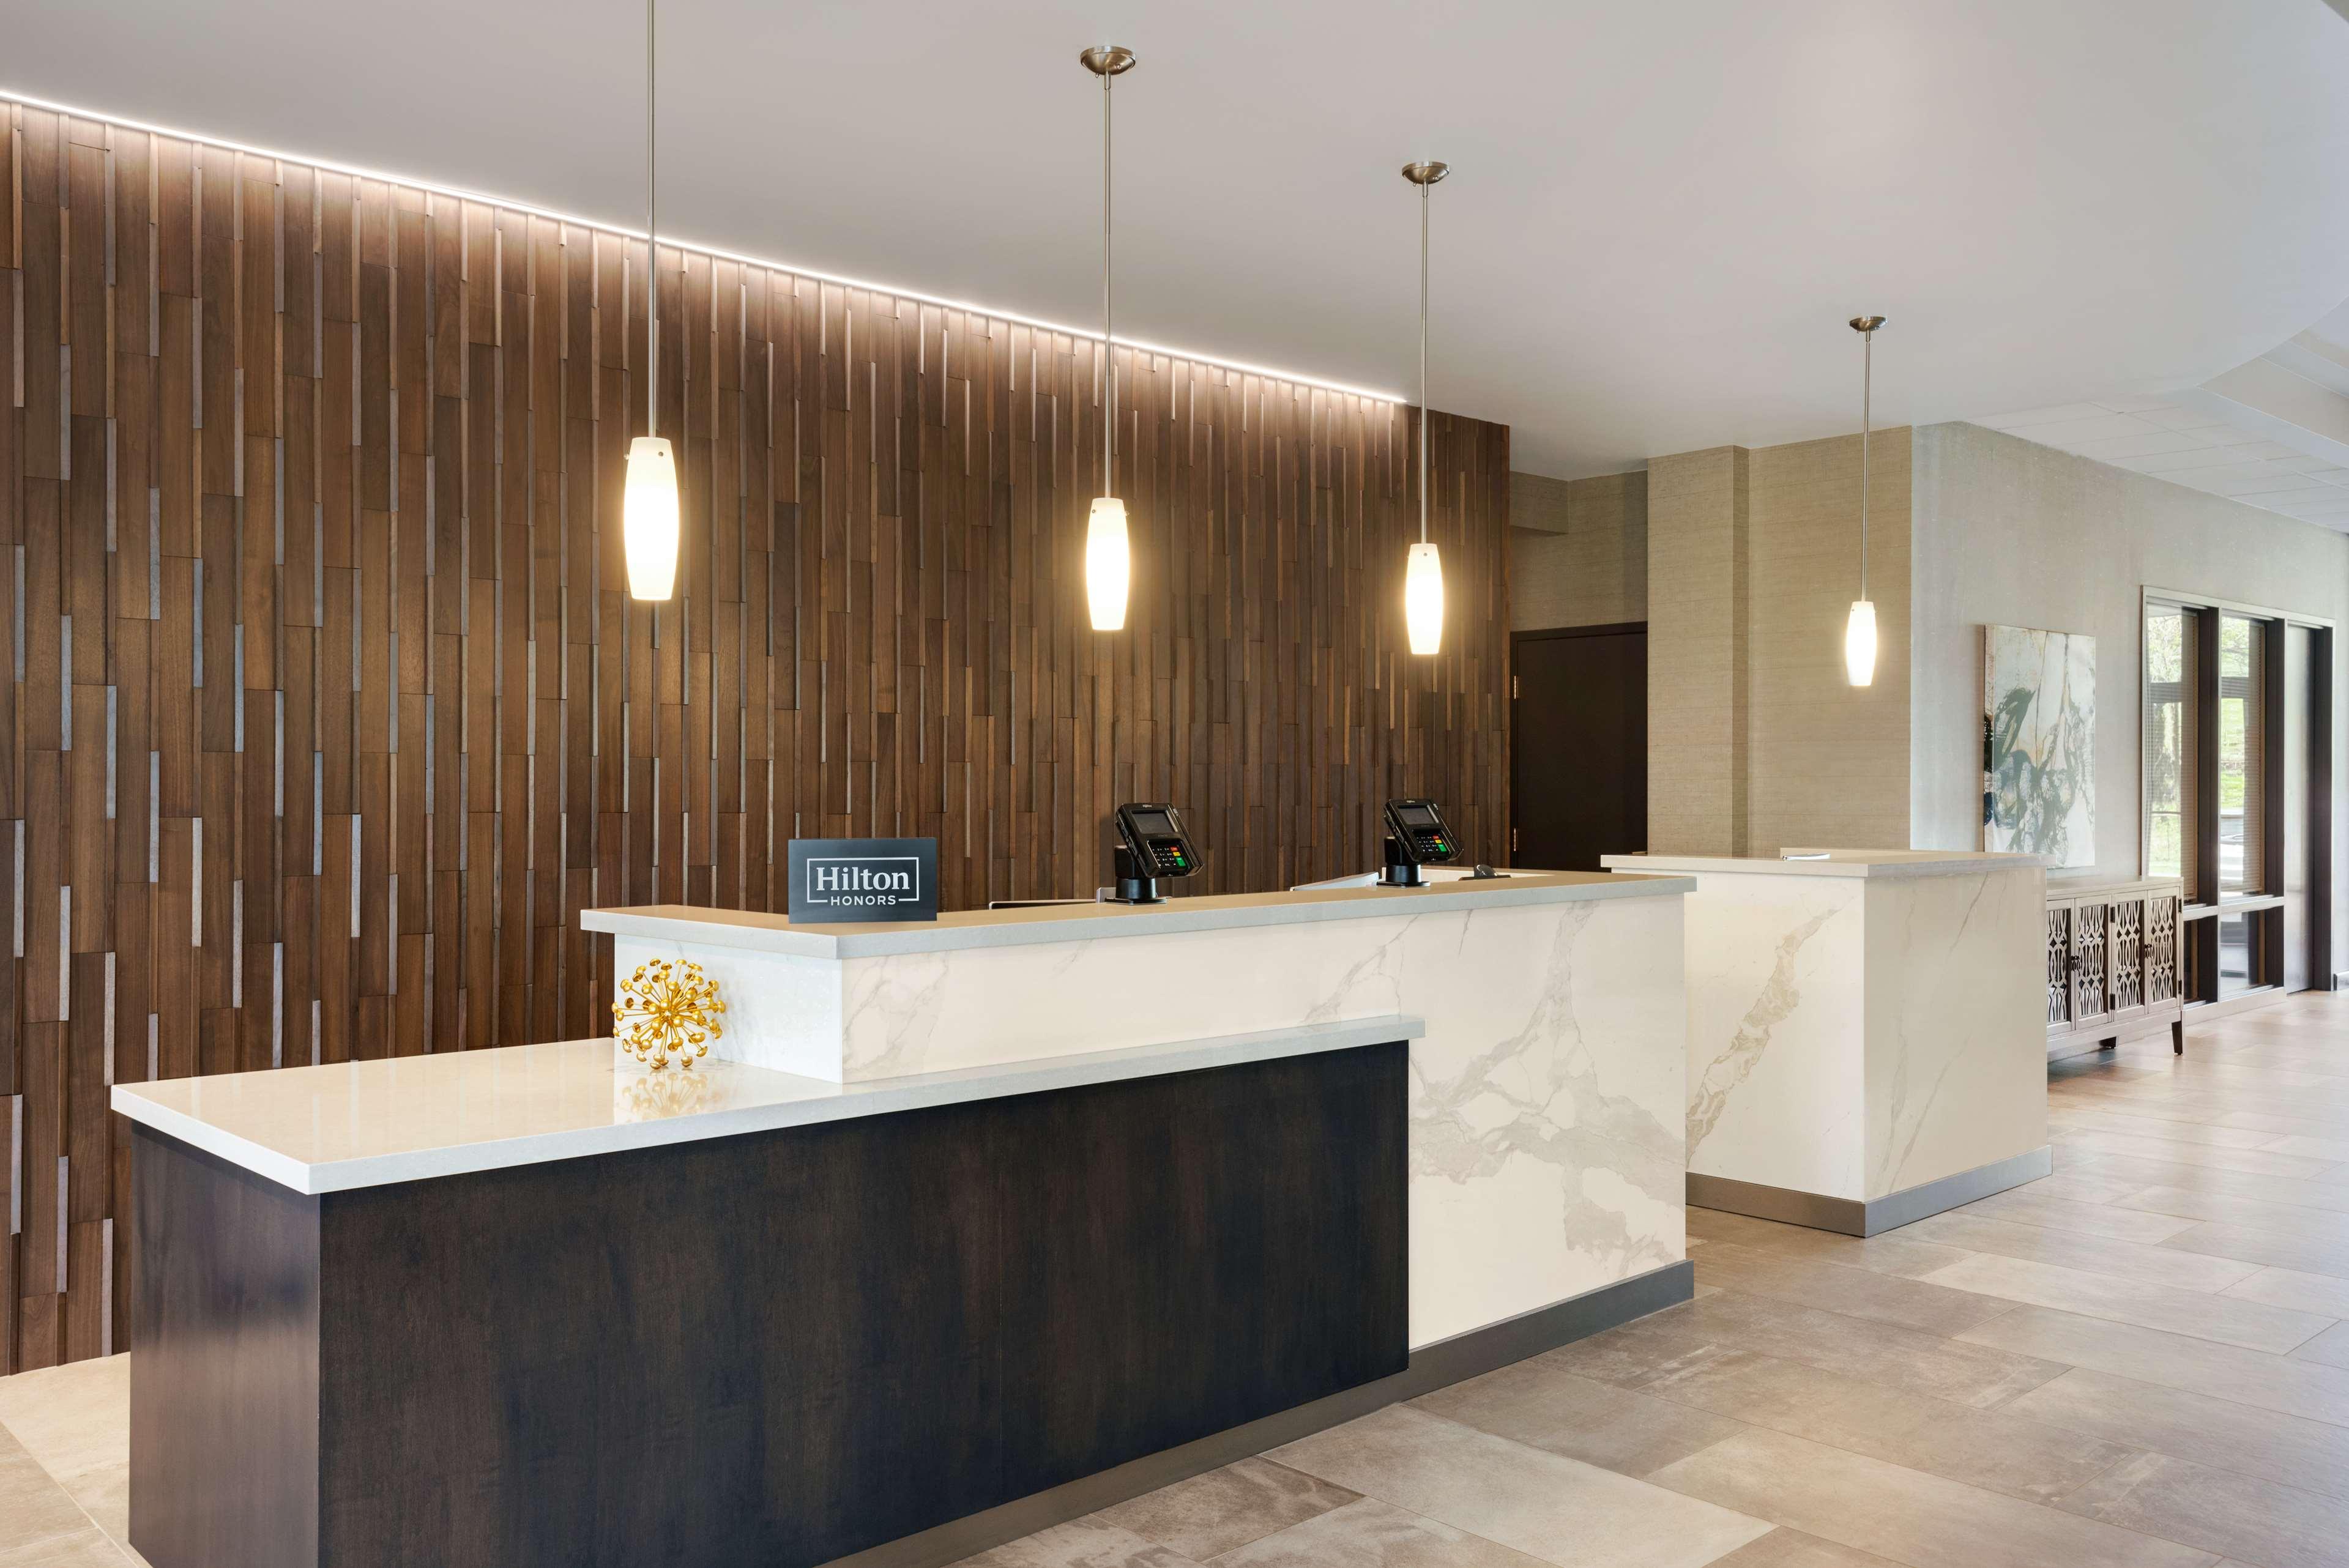 DoubleTree by Hilton St. Paul East image 3